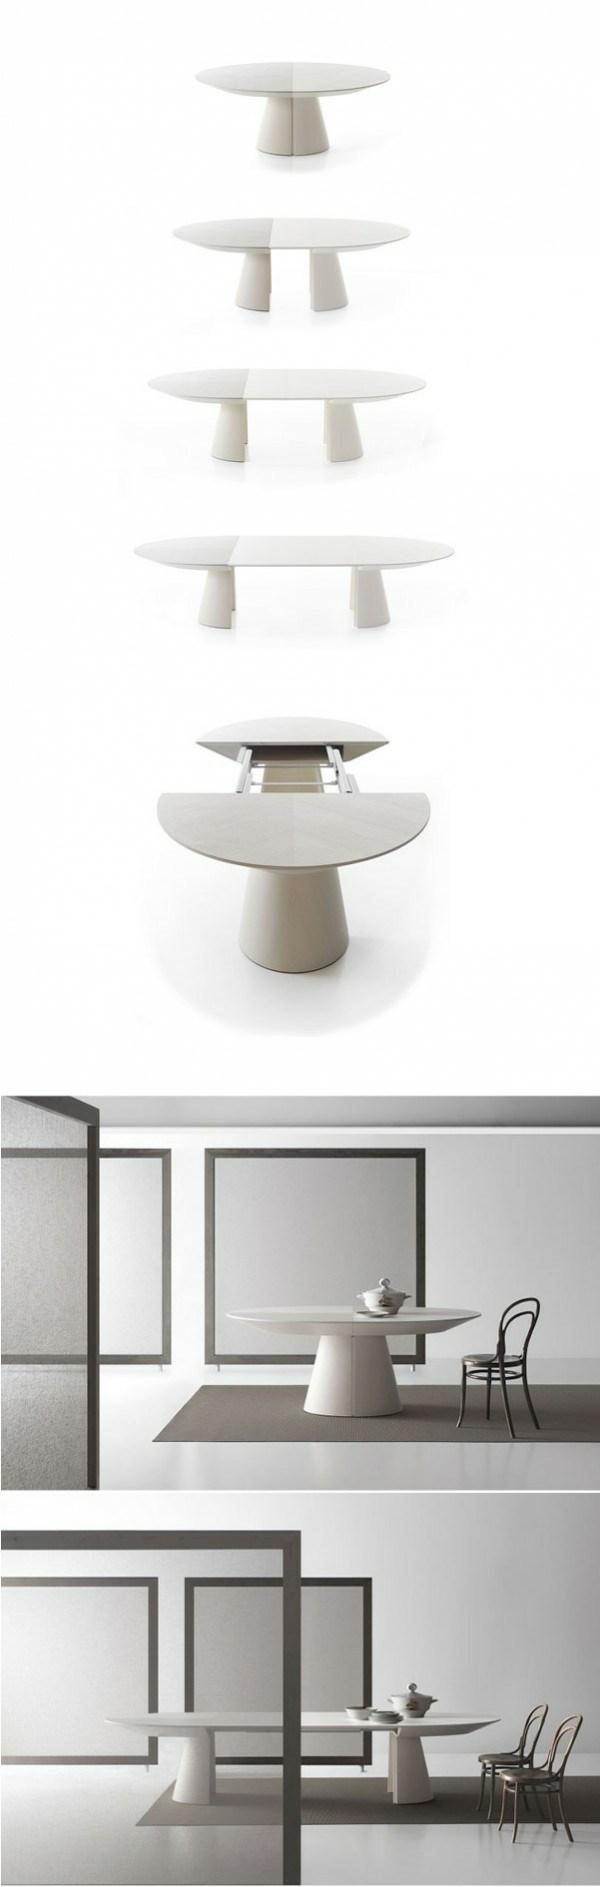 table design blanche deco Bauline